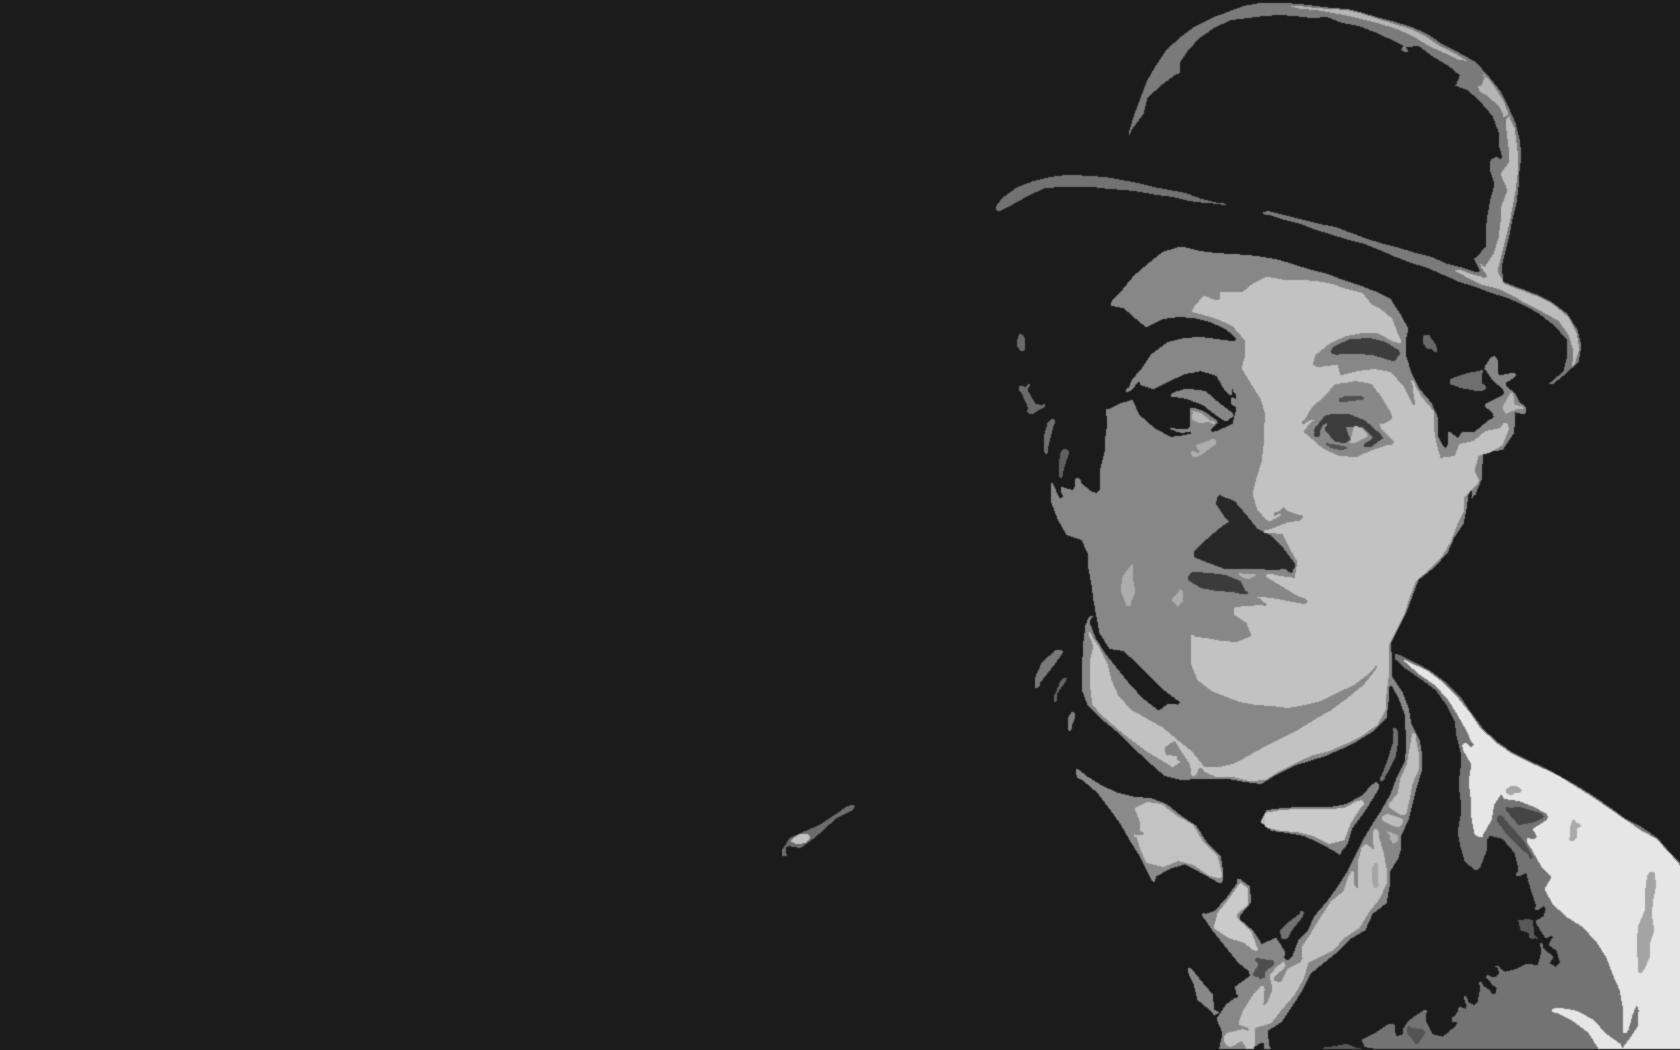 Charlie Chaplin wallpaper 1680x1050 61954 1680x1050